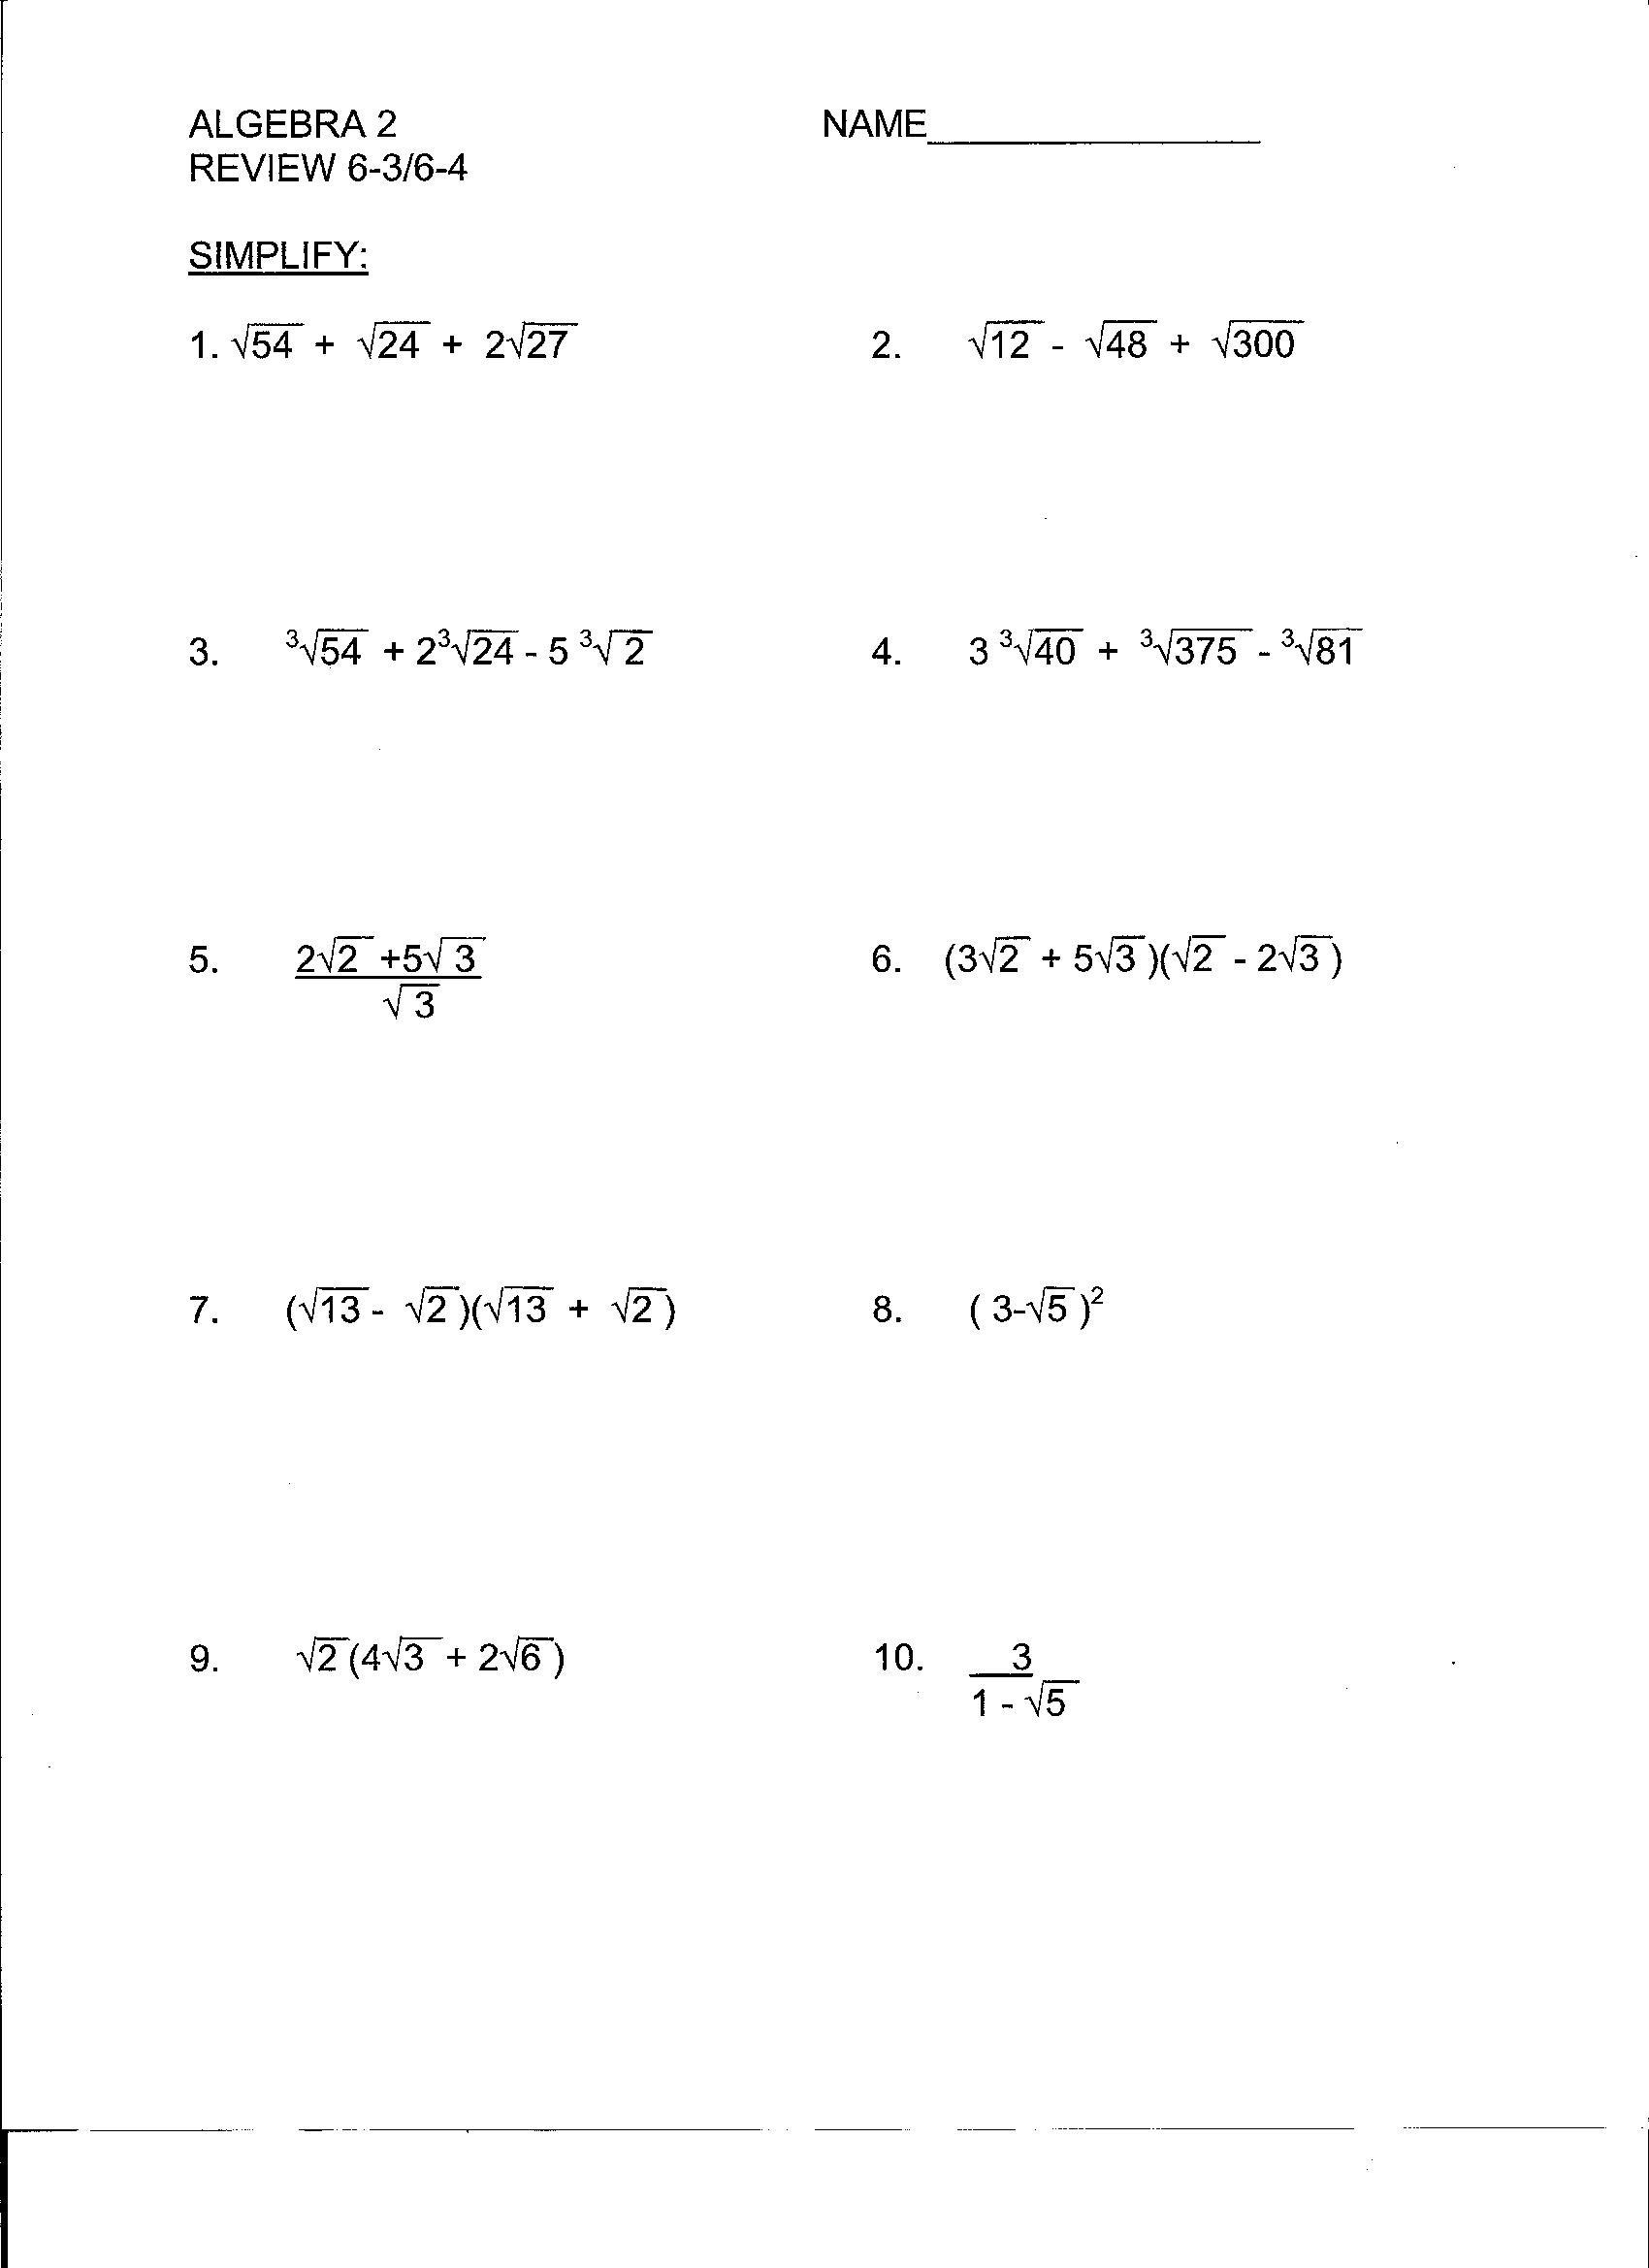 Algebra 2 Review Worksheet Beunier Smith Yvette College Algebra Documents